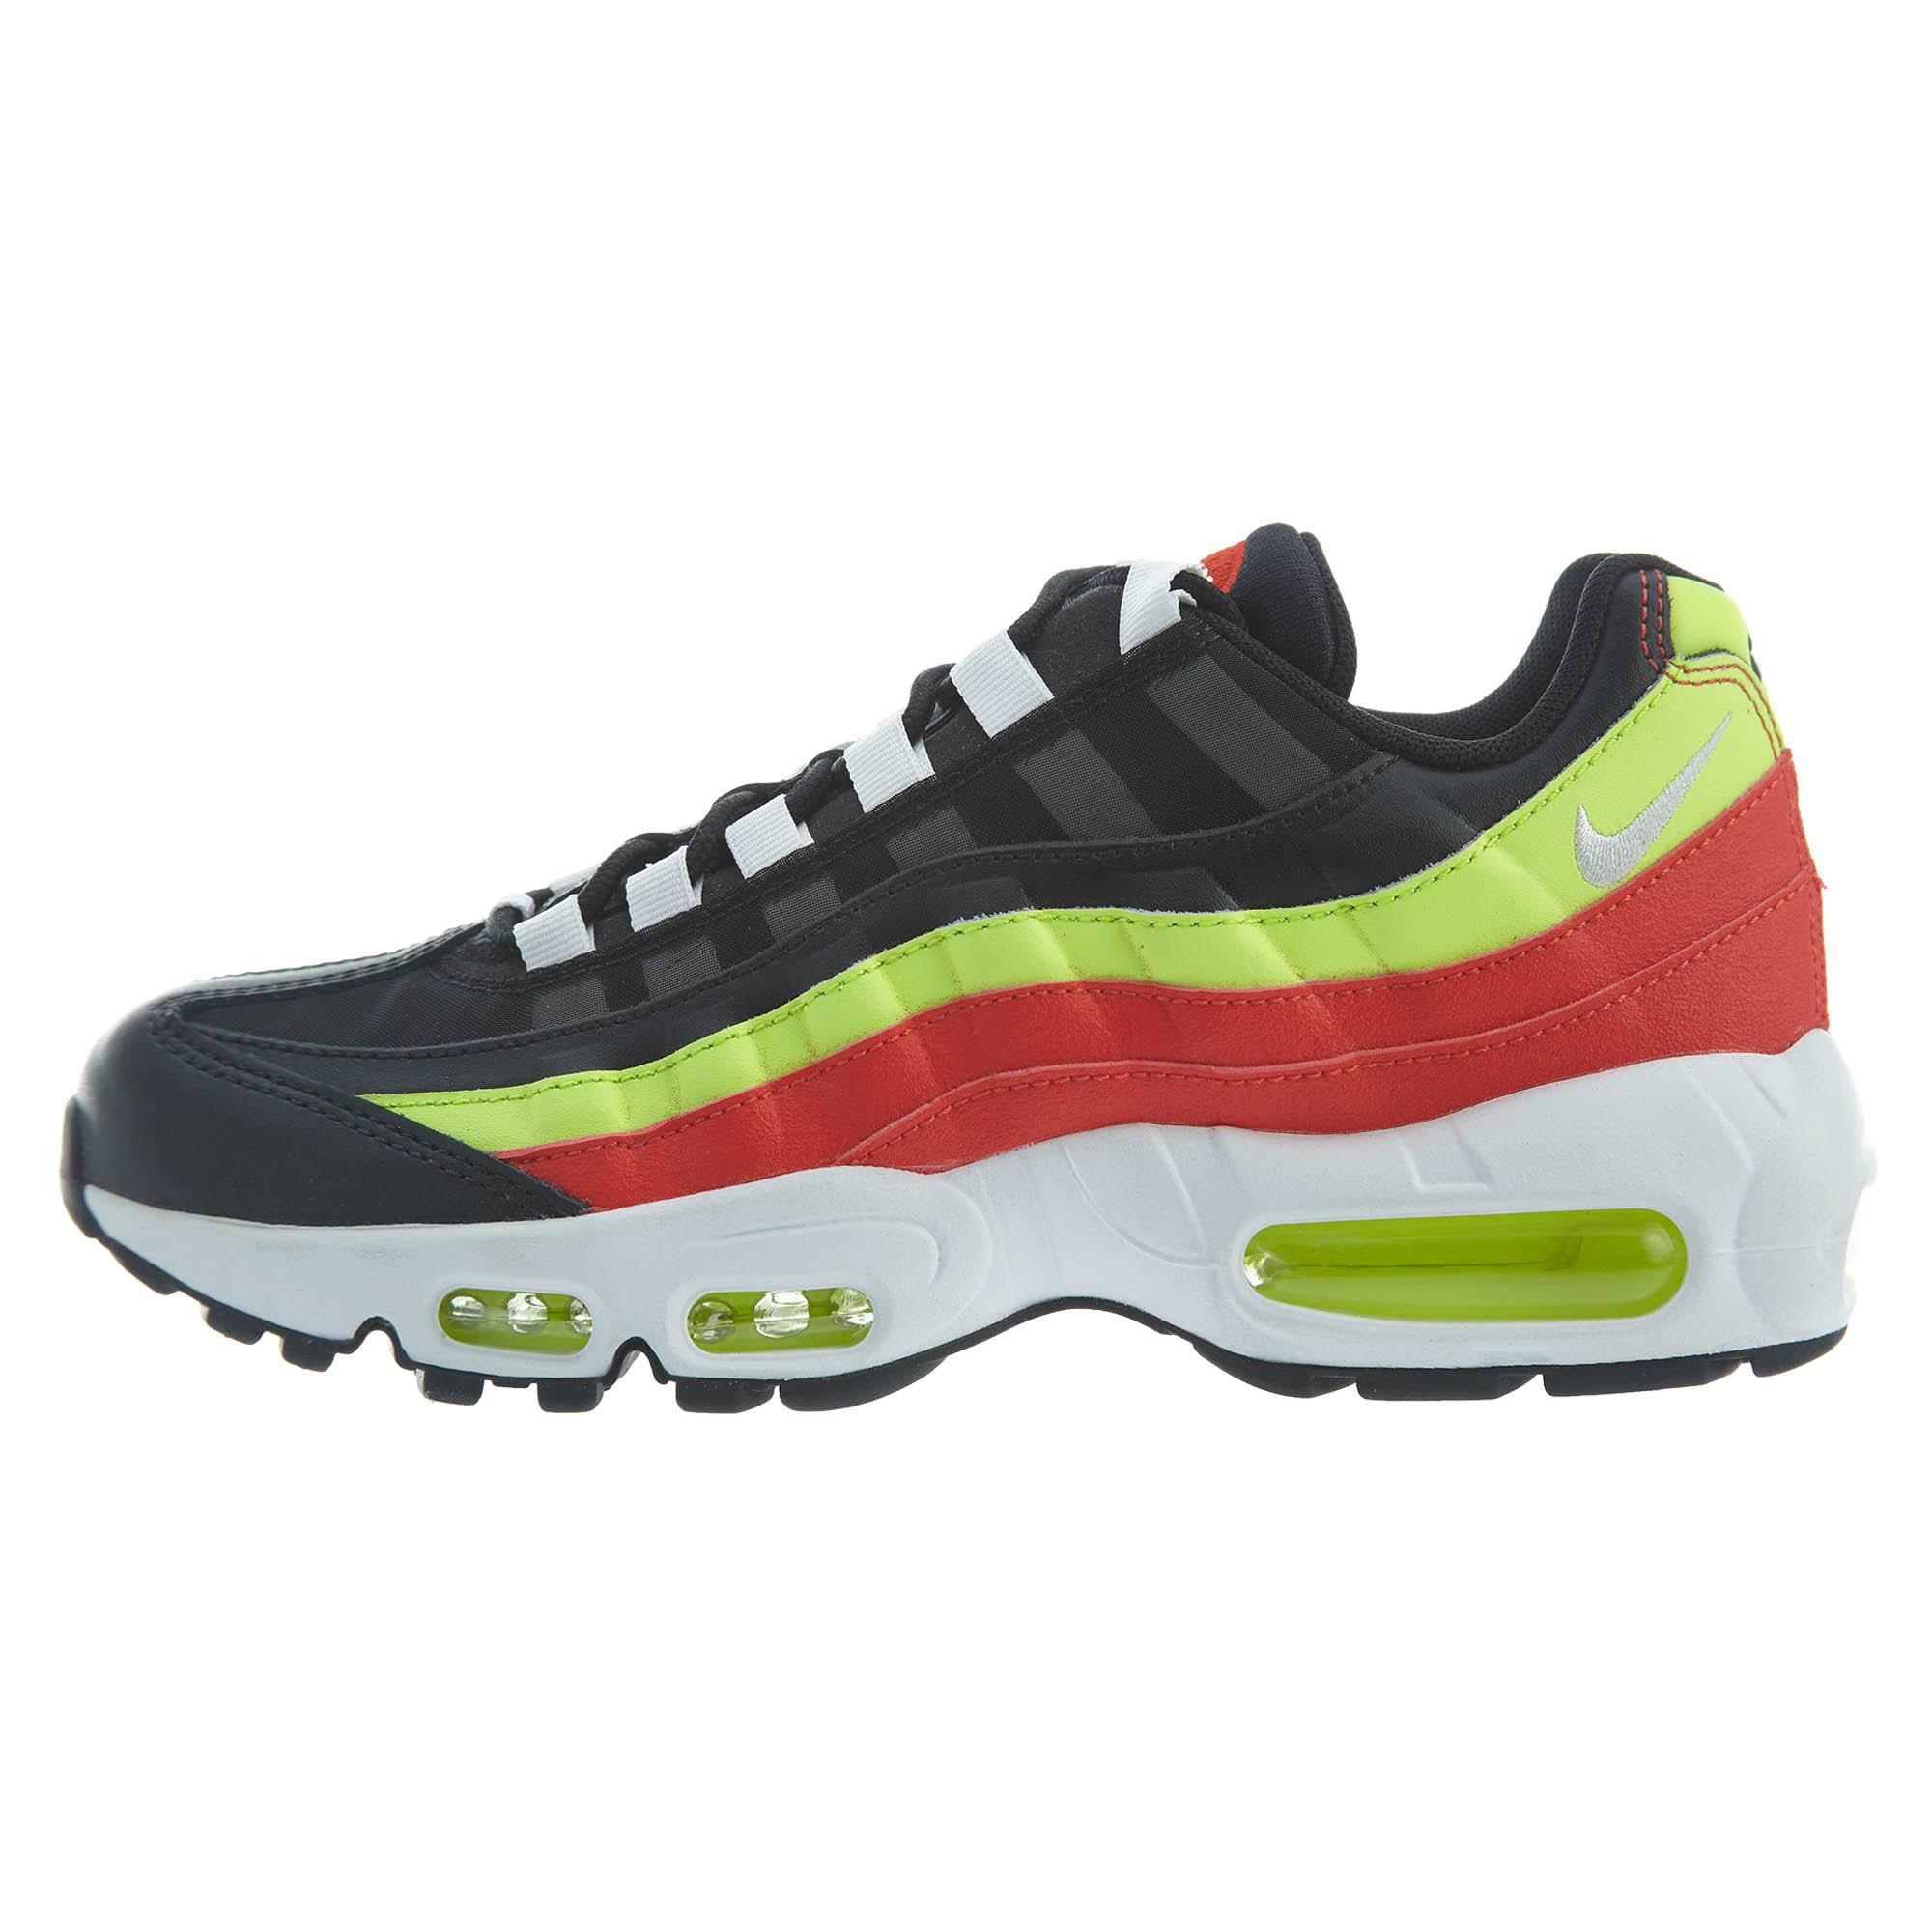 Max Nike Roodvolt 5 Zwartwithabanero 95Damesschoenen Air rood maat JFT1Kl3c